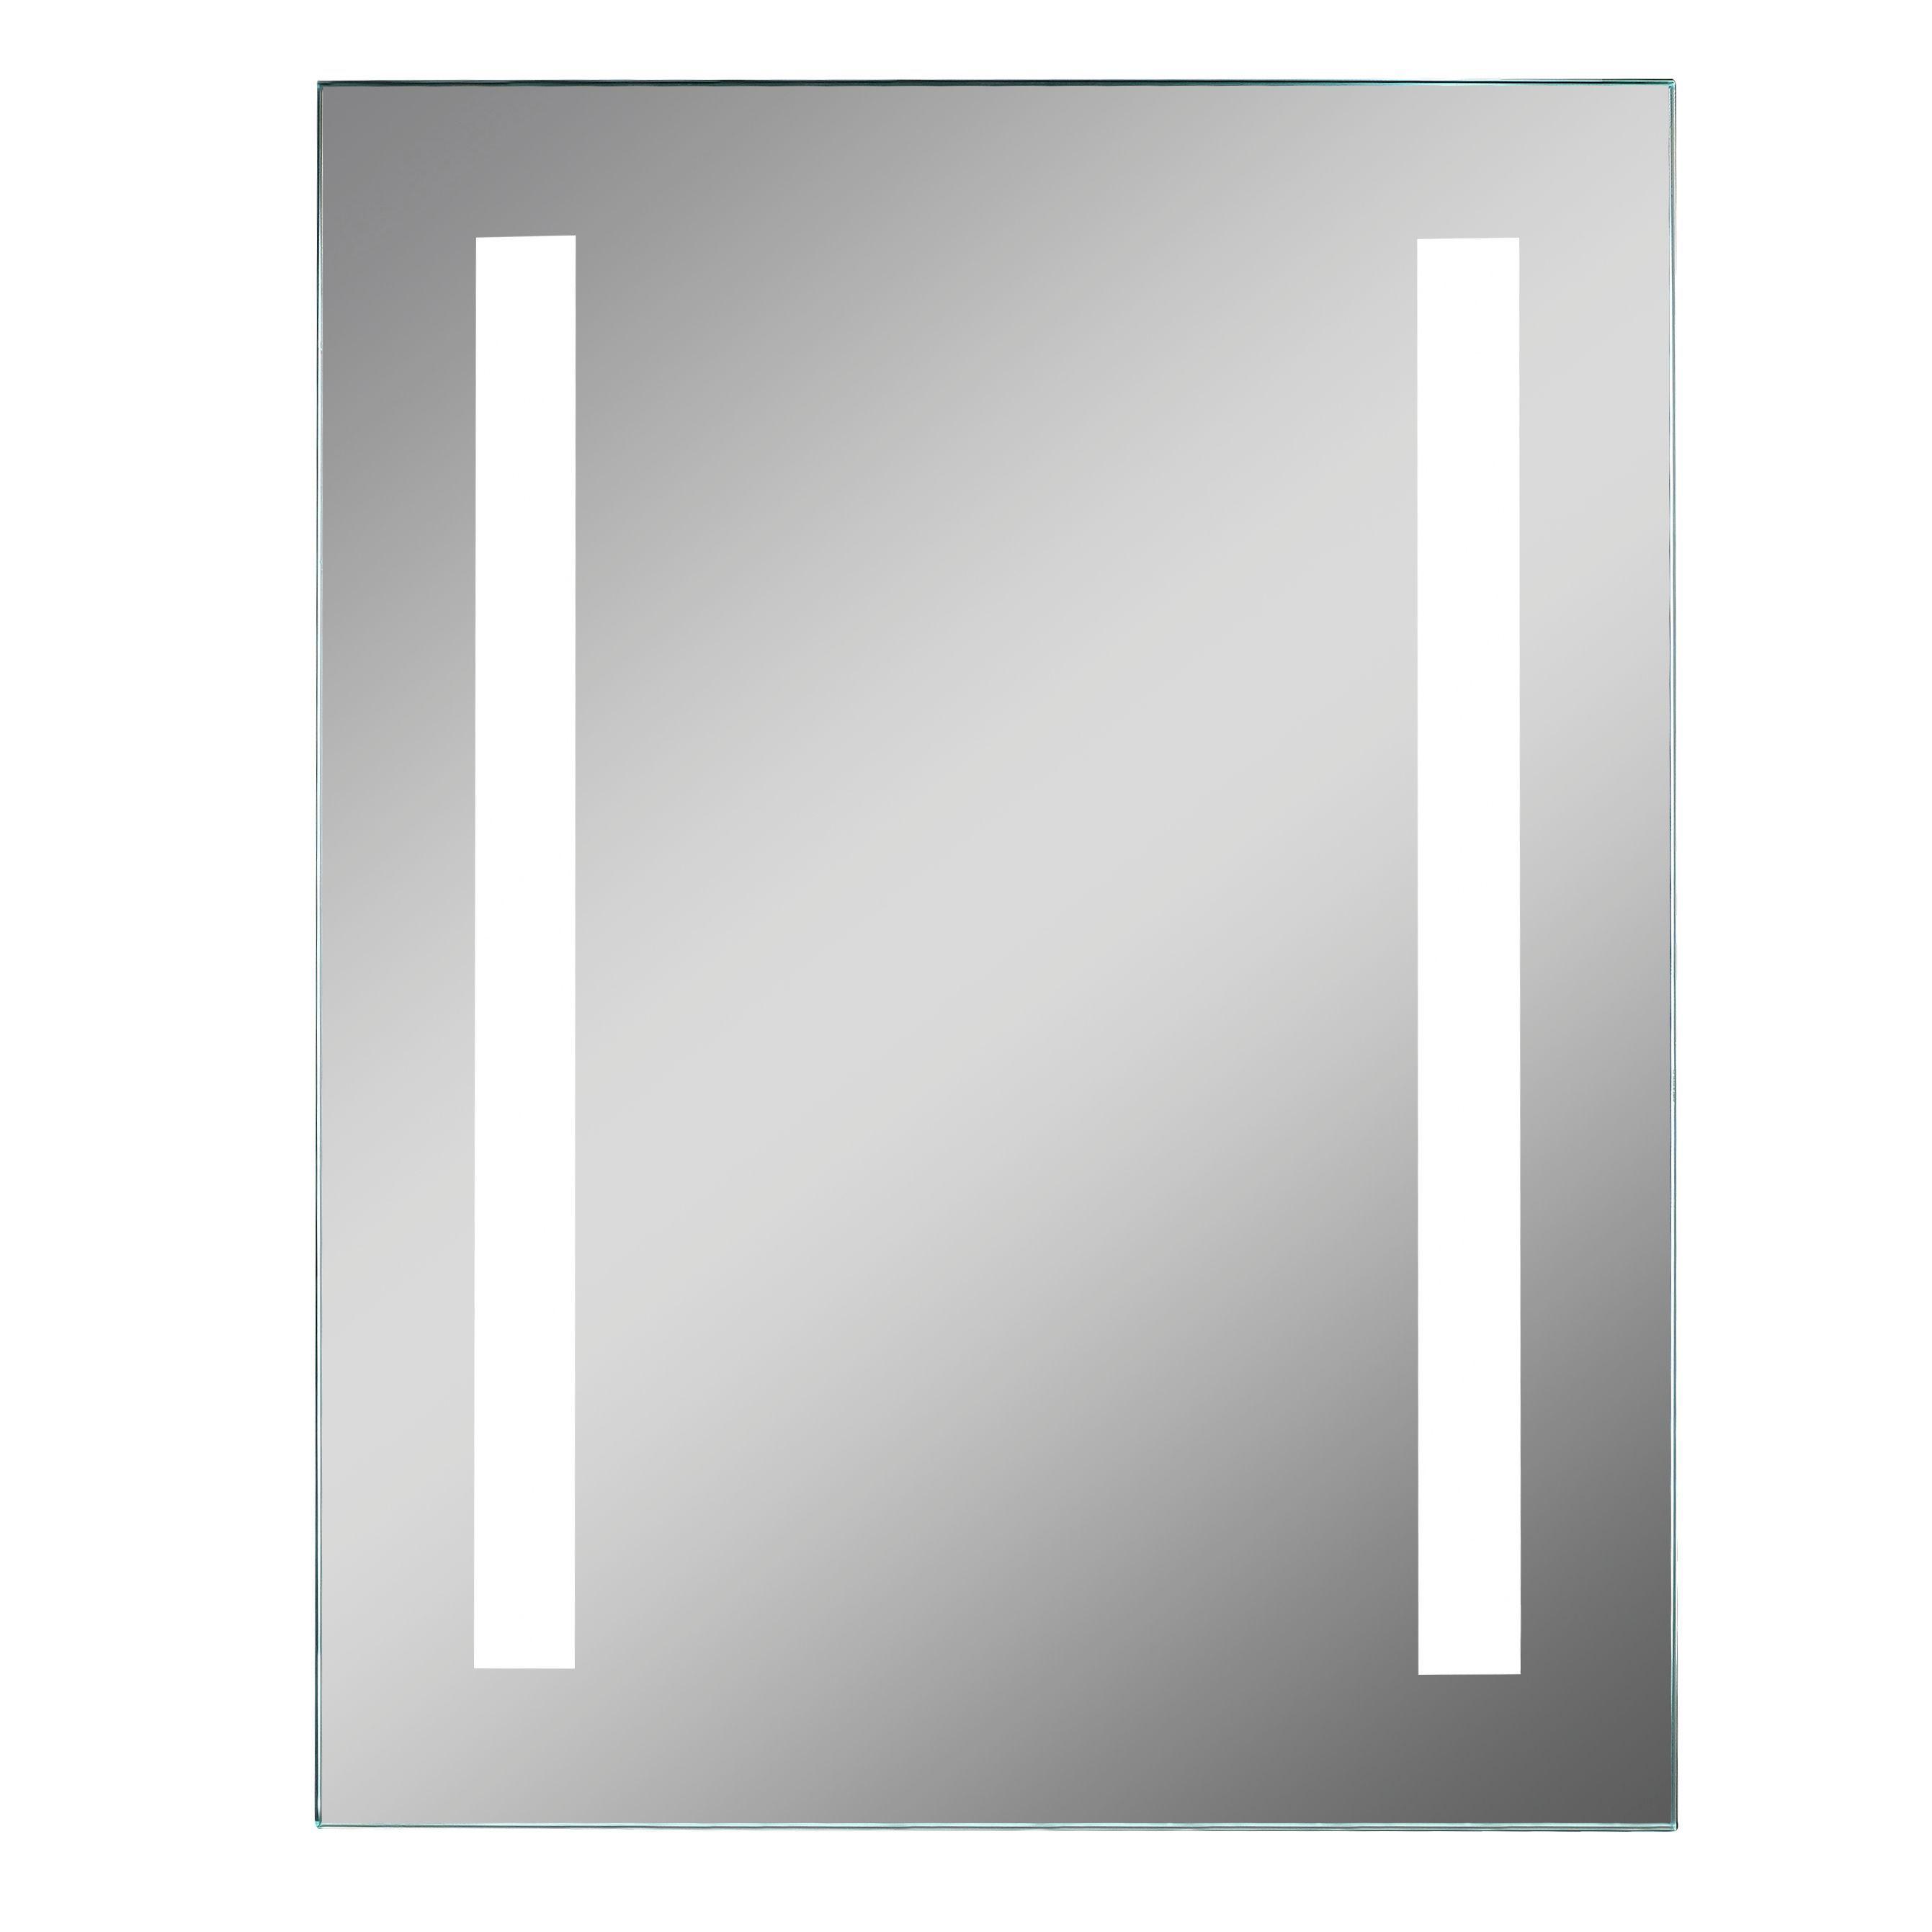 Lumino Clarino Illuminated Bathroom Rectangular Mirror With Shaver Socket (w)390mm (h)500mm